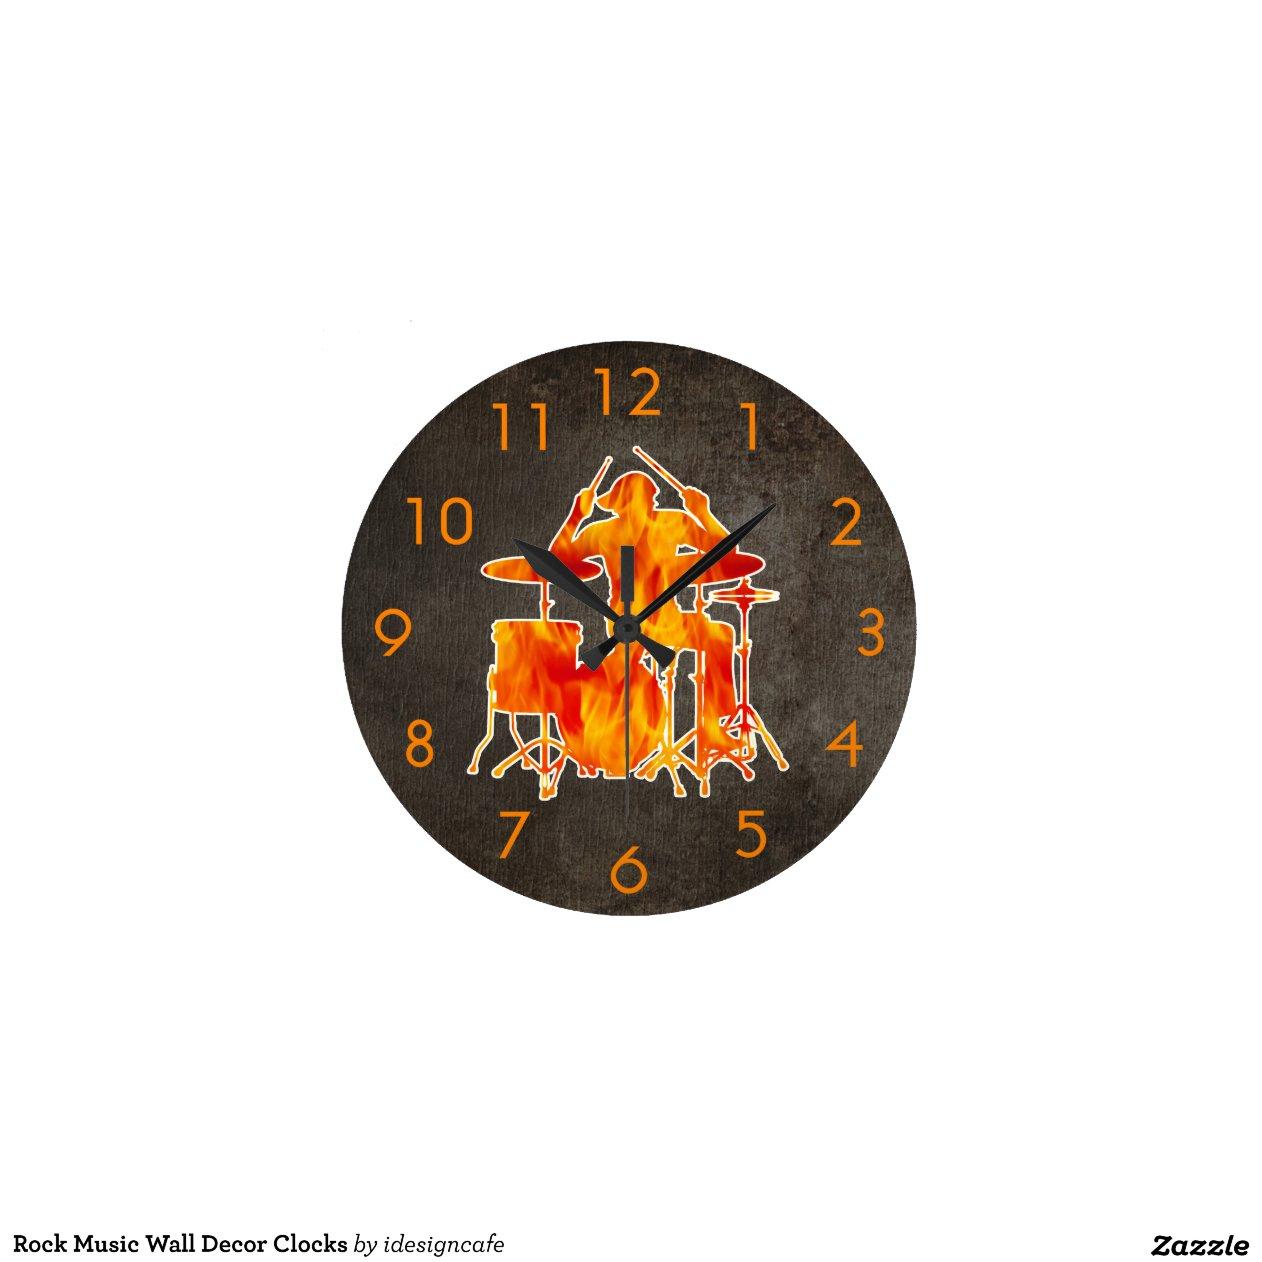 Wall Of Clocks Decor : Rock music wall decor clocks zazzle